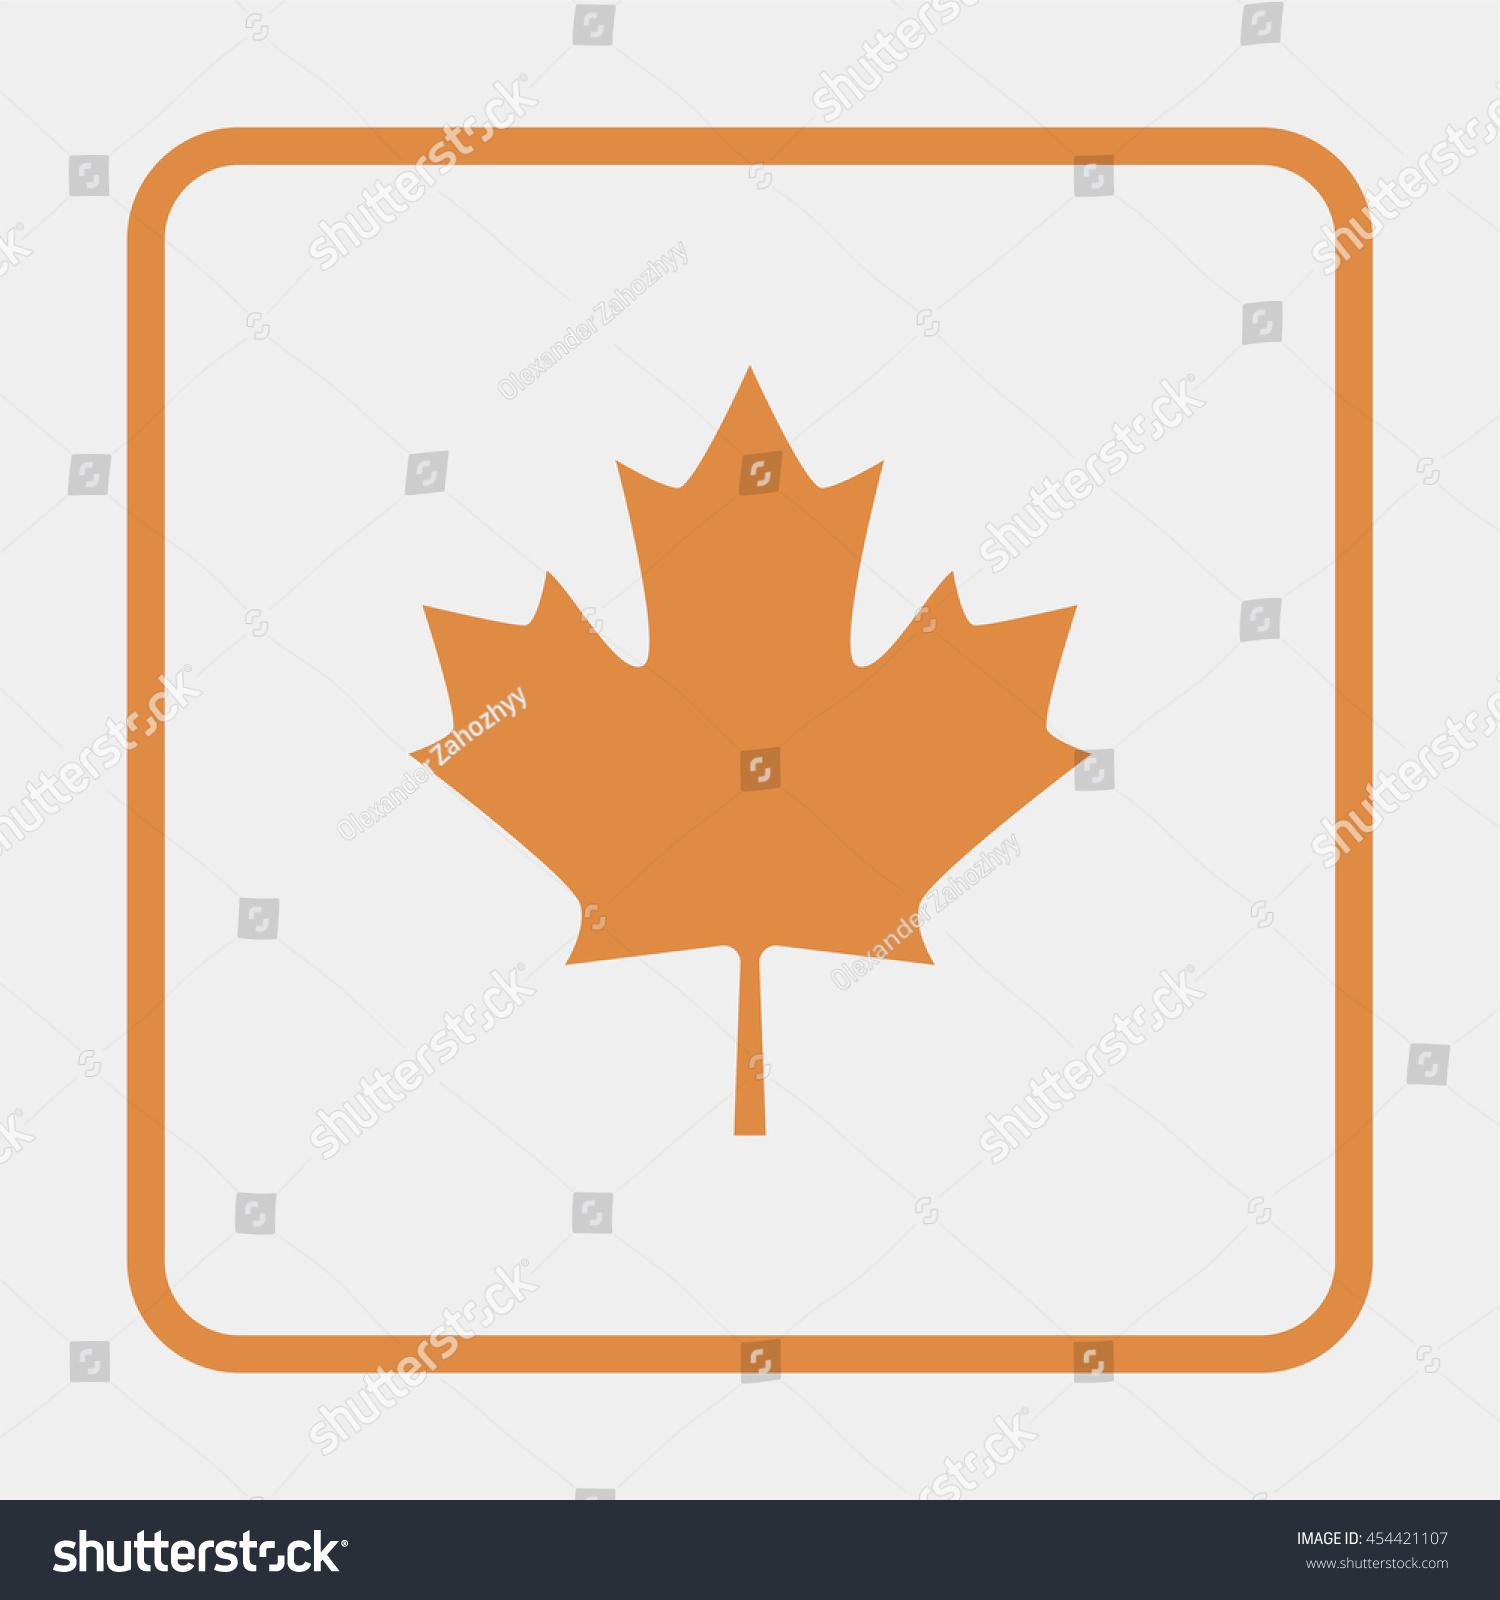 Maple Leaf Symbol Canada Vectores En Stock 454421107 - Shutterstock